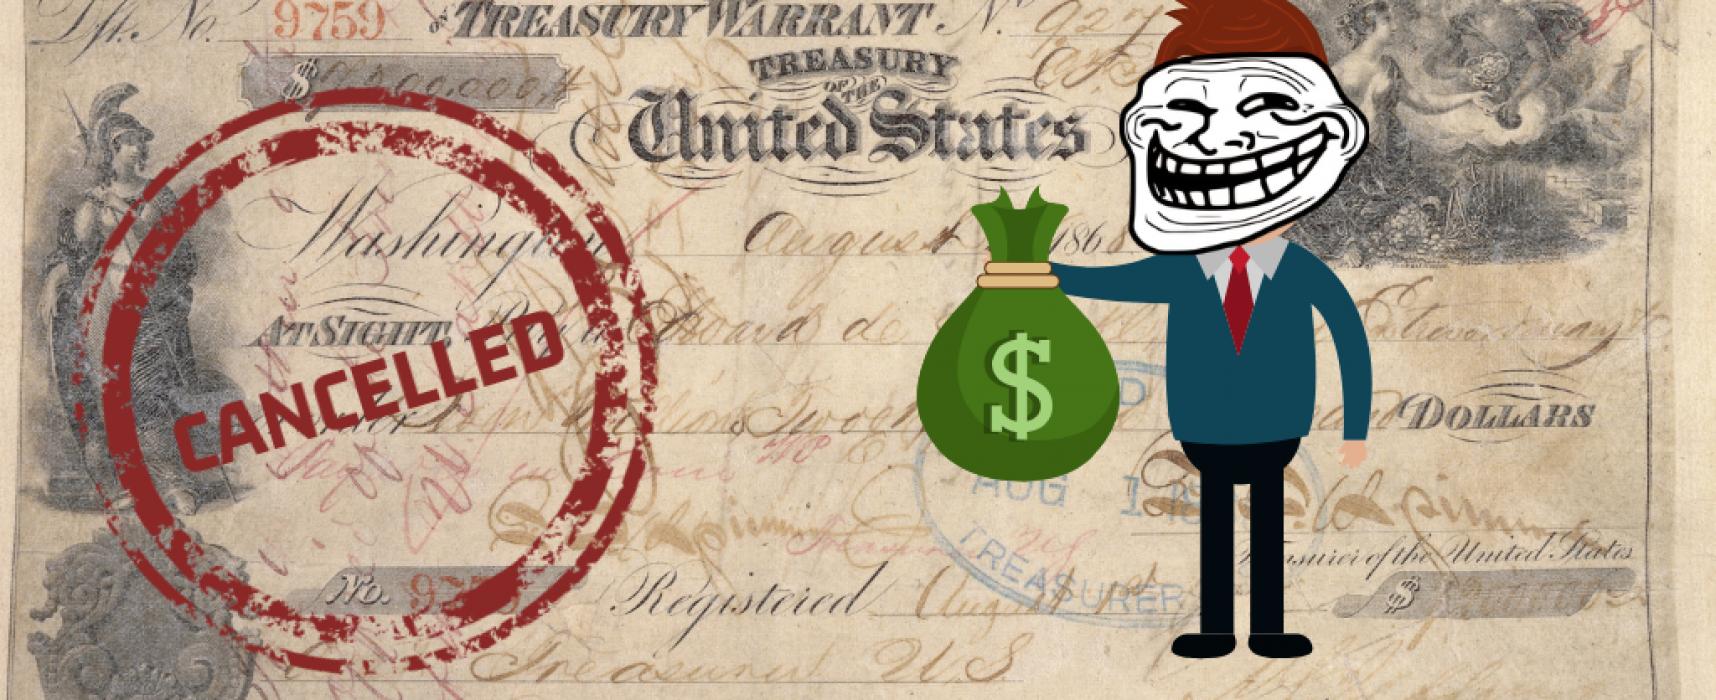 Alaska purchase: Kremlin's trolls suggest a refund